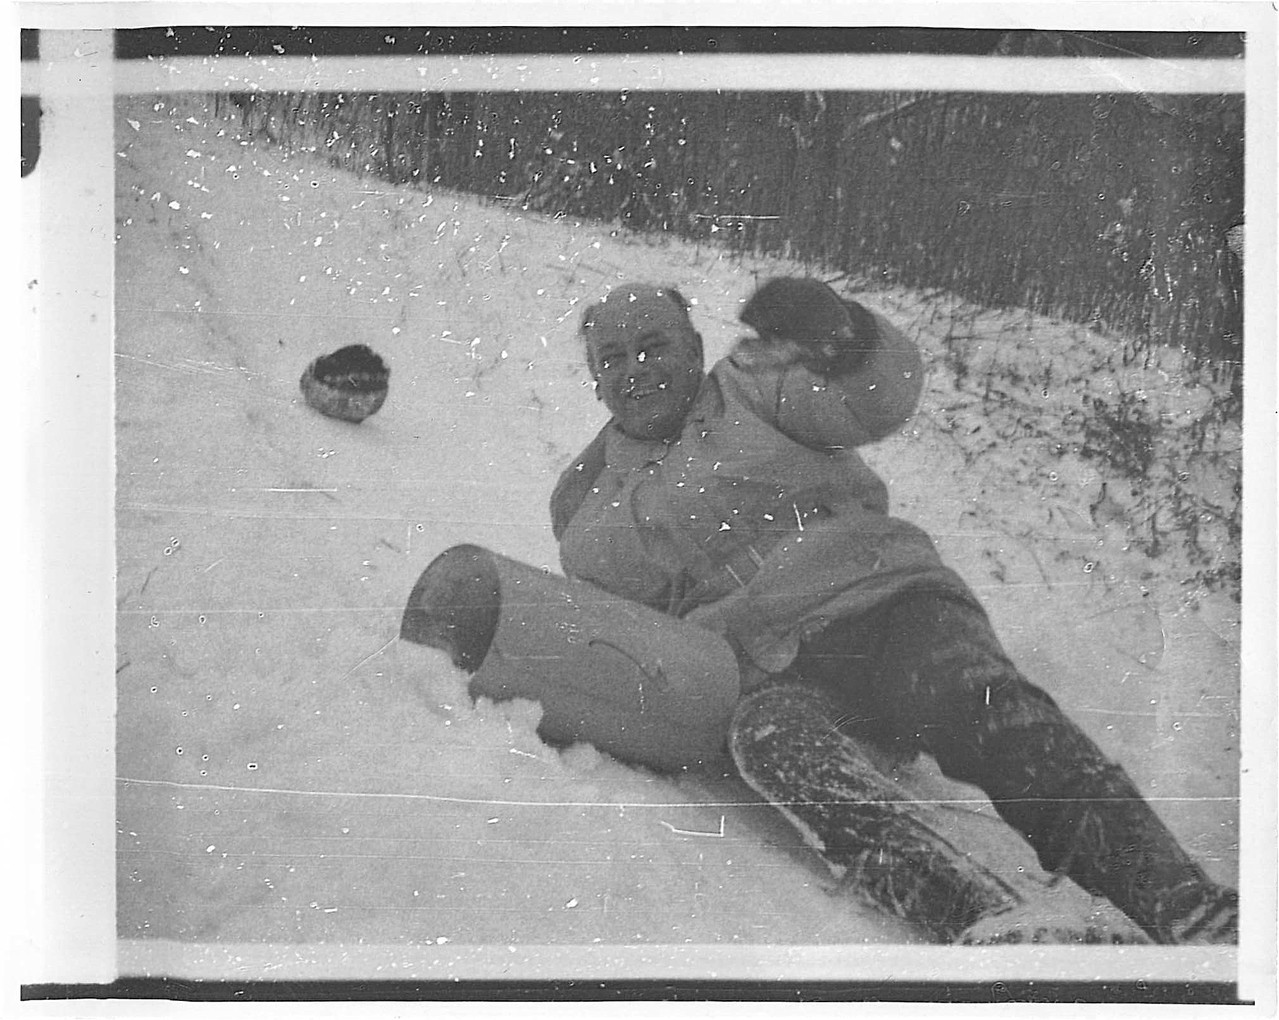 Albert Gudas sledding, 1974